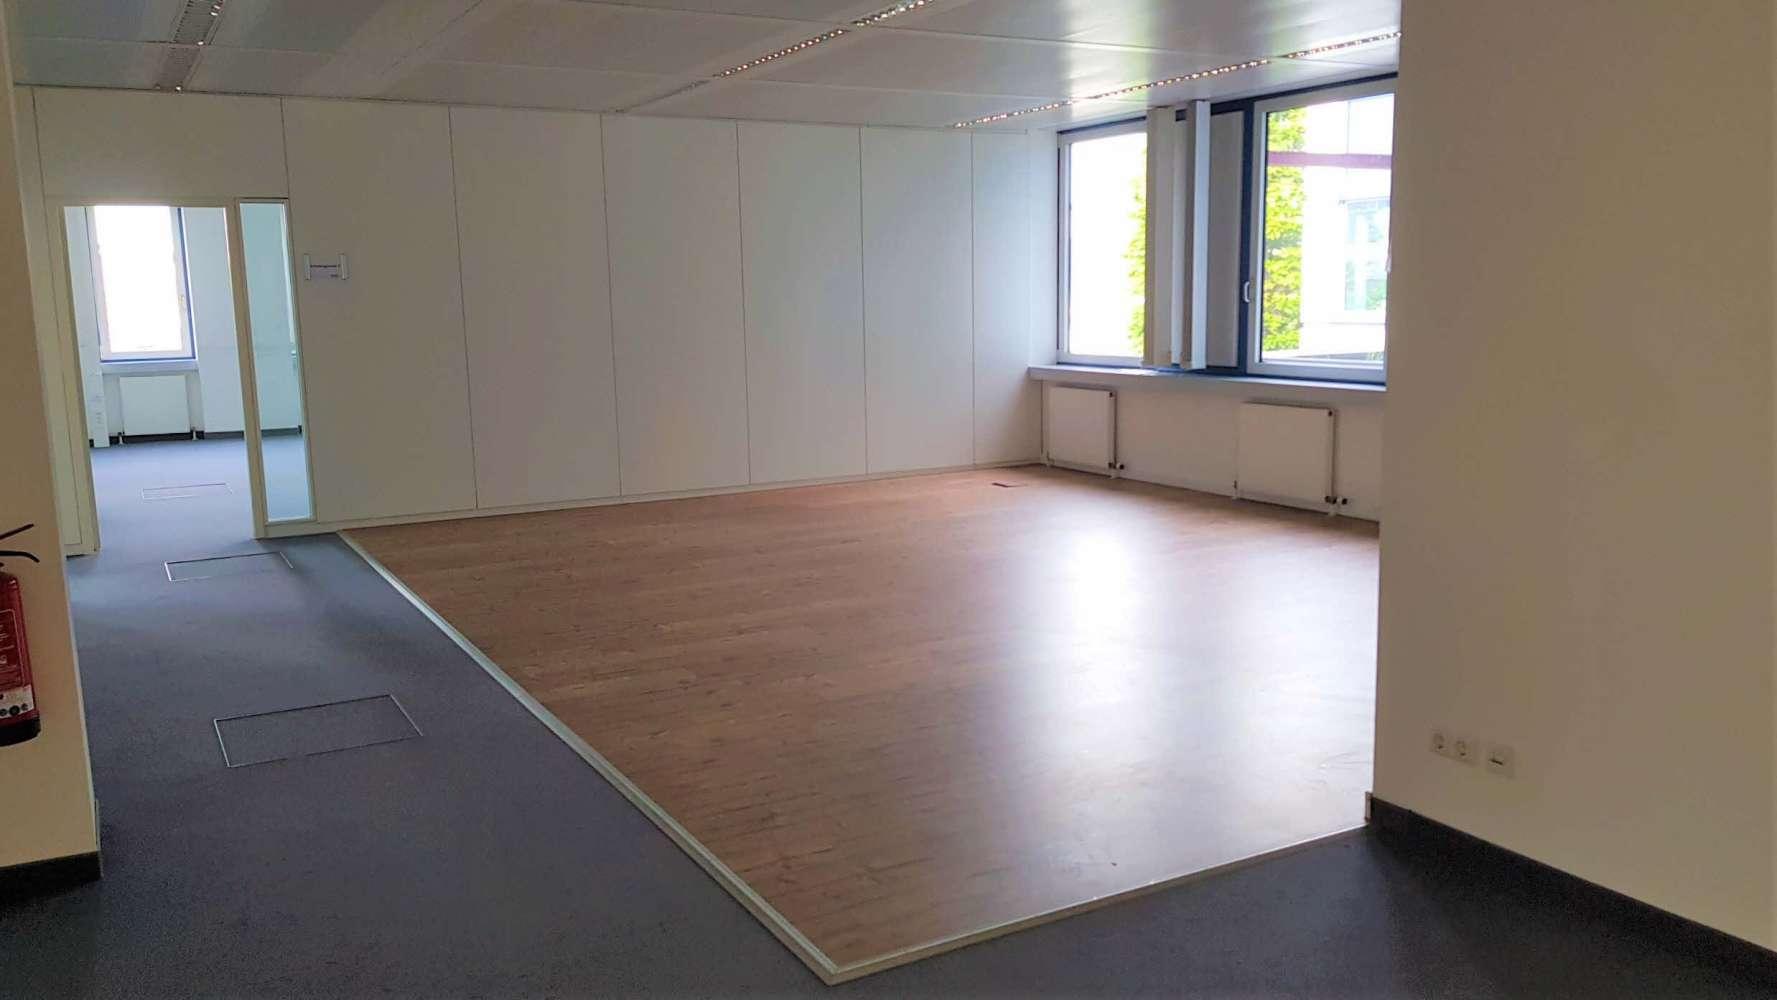 Büros Frankfurt am main, 60437 - Büro - Frankfurt am Main, Nieder-Eschbach - F1908 - 10645646